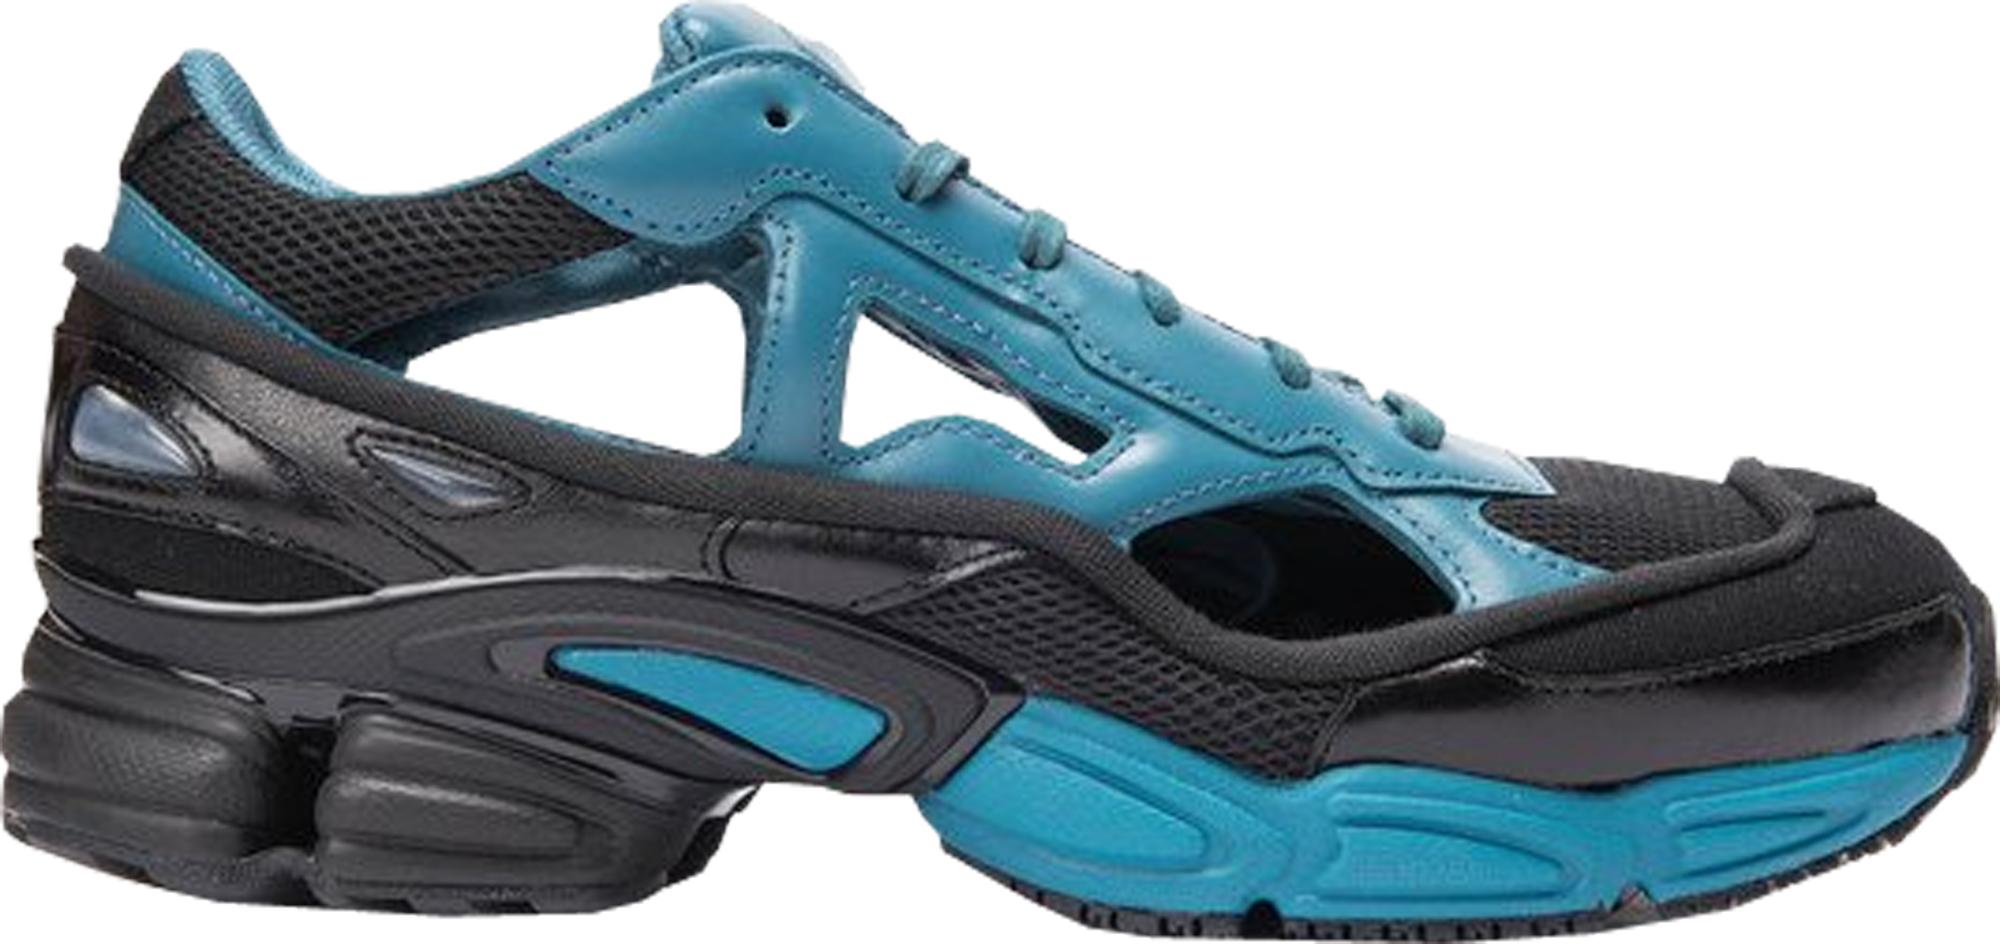 adidas RS Replicant Ozweego Raf Simons Colonial Blue